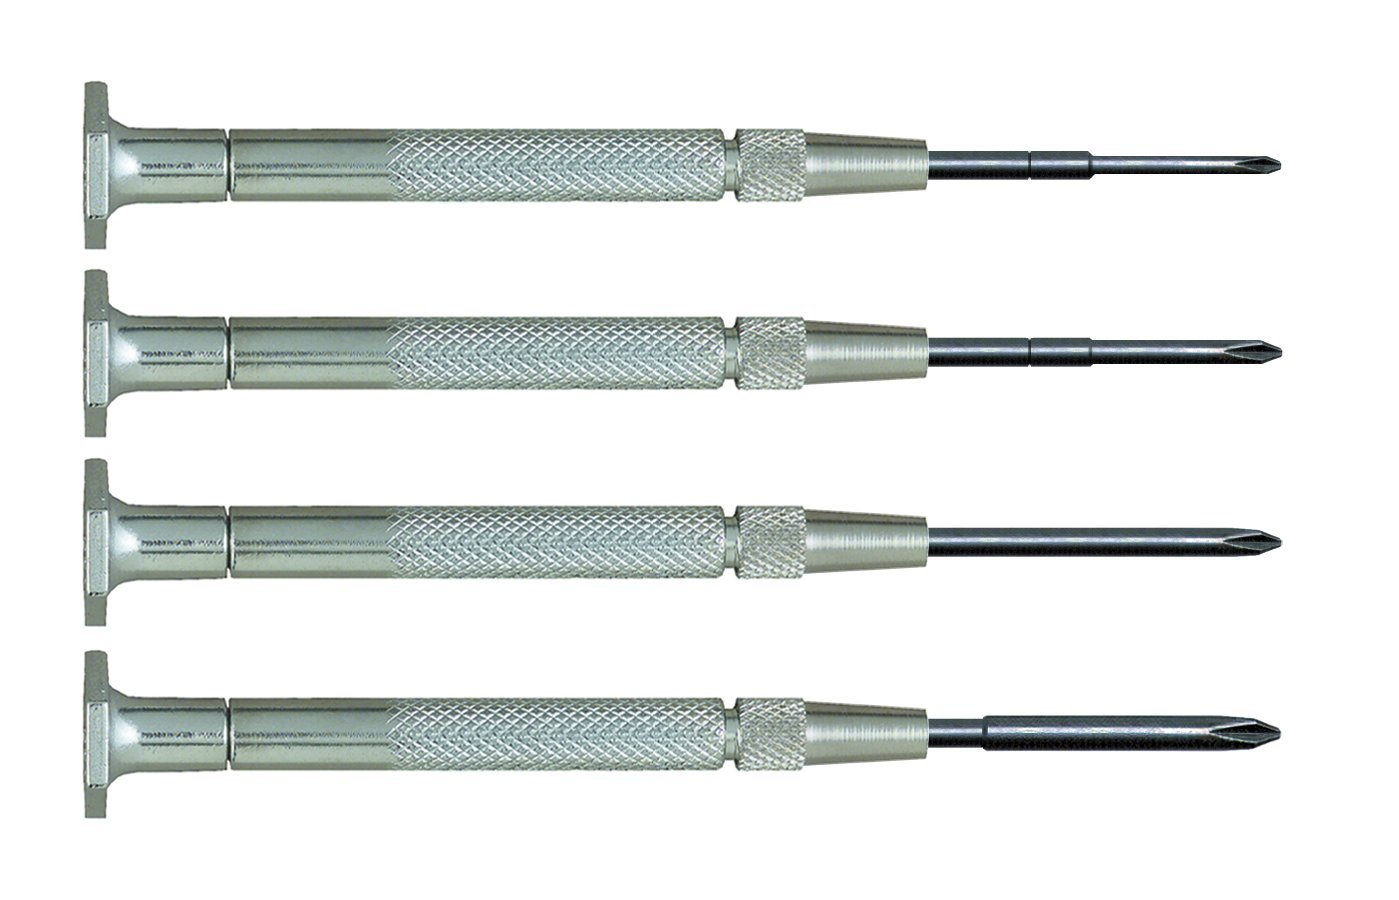 Moody Tools MT-PSD500 JIS Mini Phillips Driver Set by Moody Tools